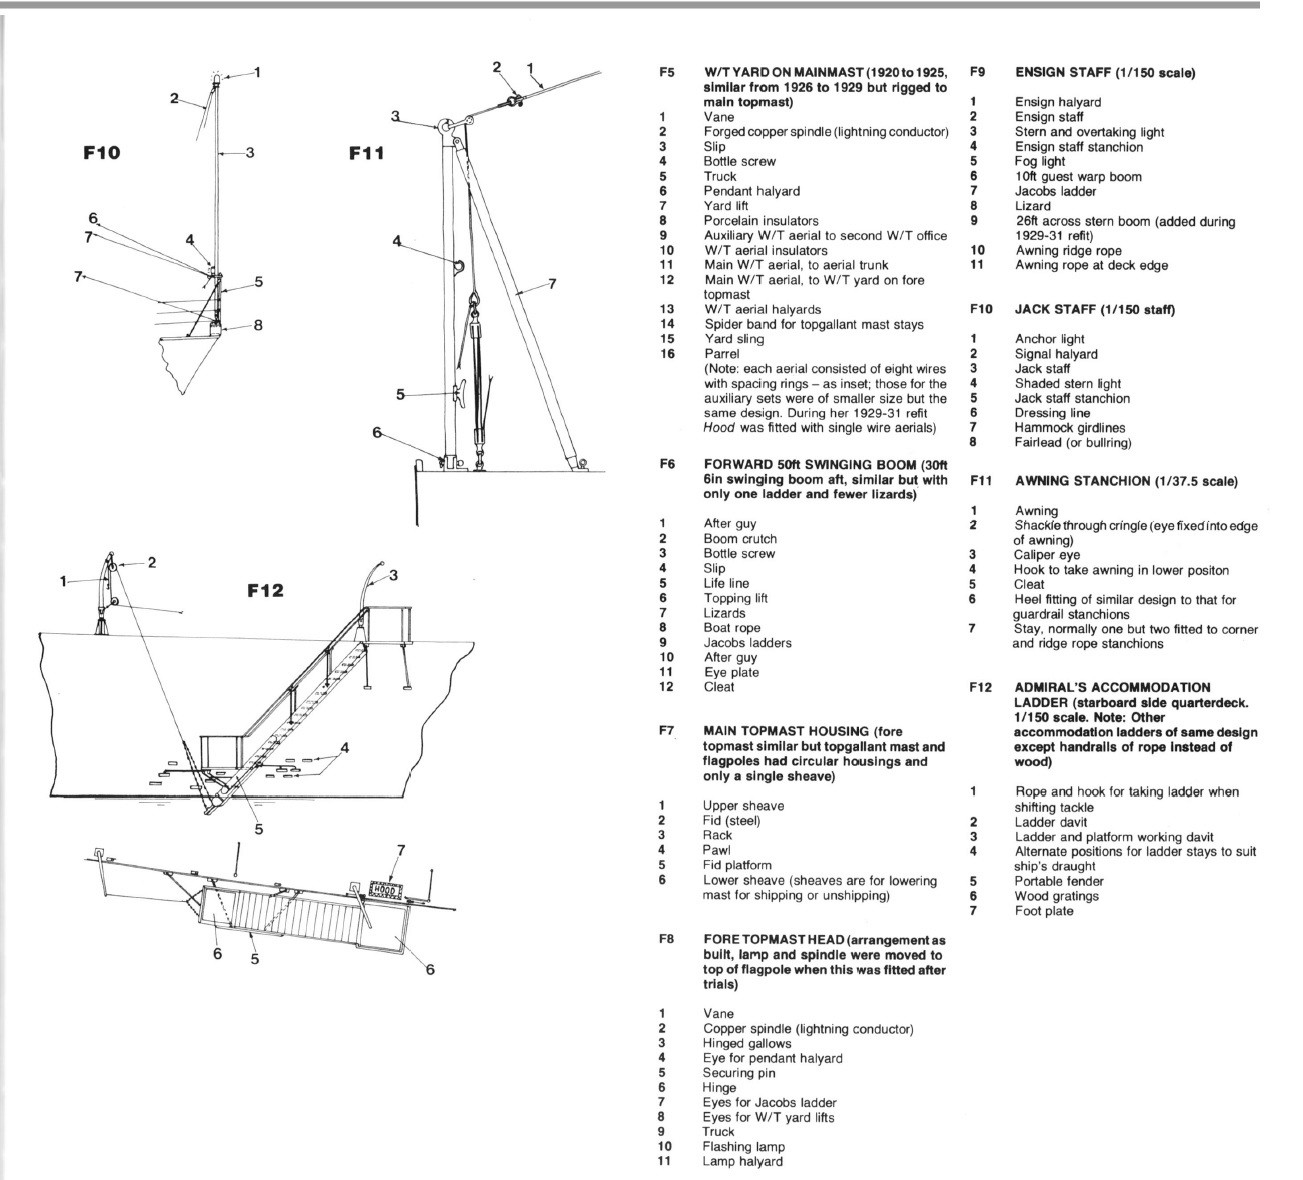 hight resolution of jacobs pro street wiring diagram 2000 freightliner fl70 freightliner fl112 fuse box diagram fl70 fuse box